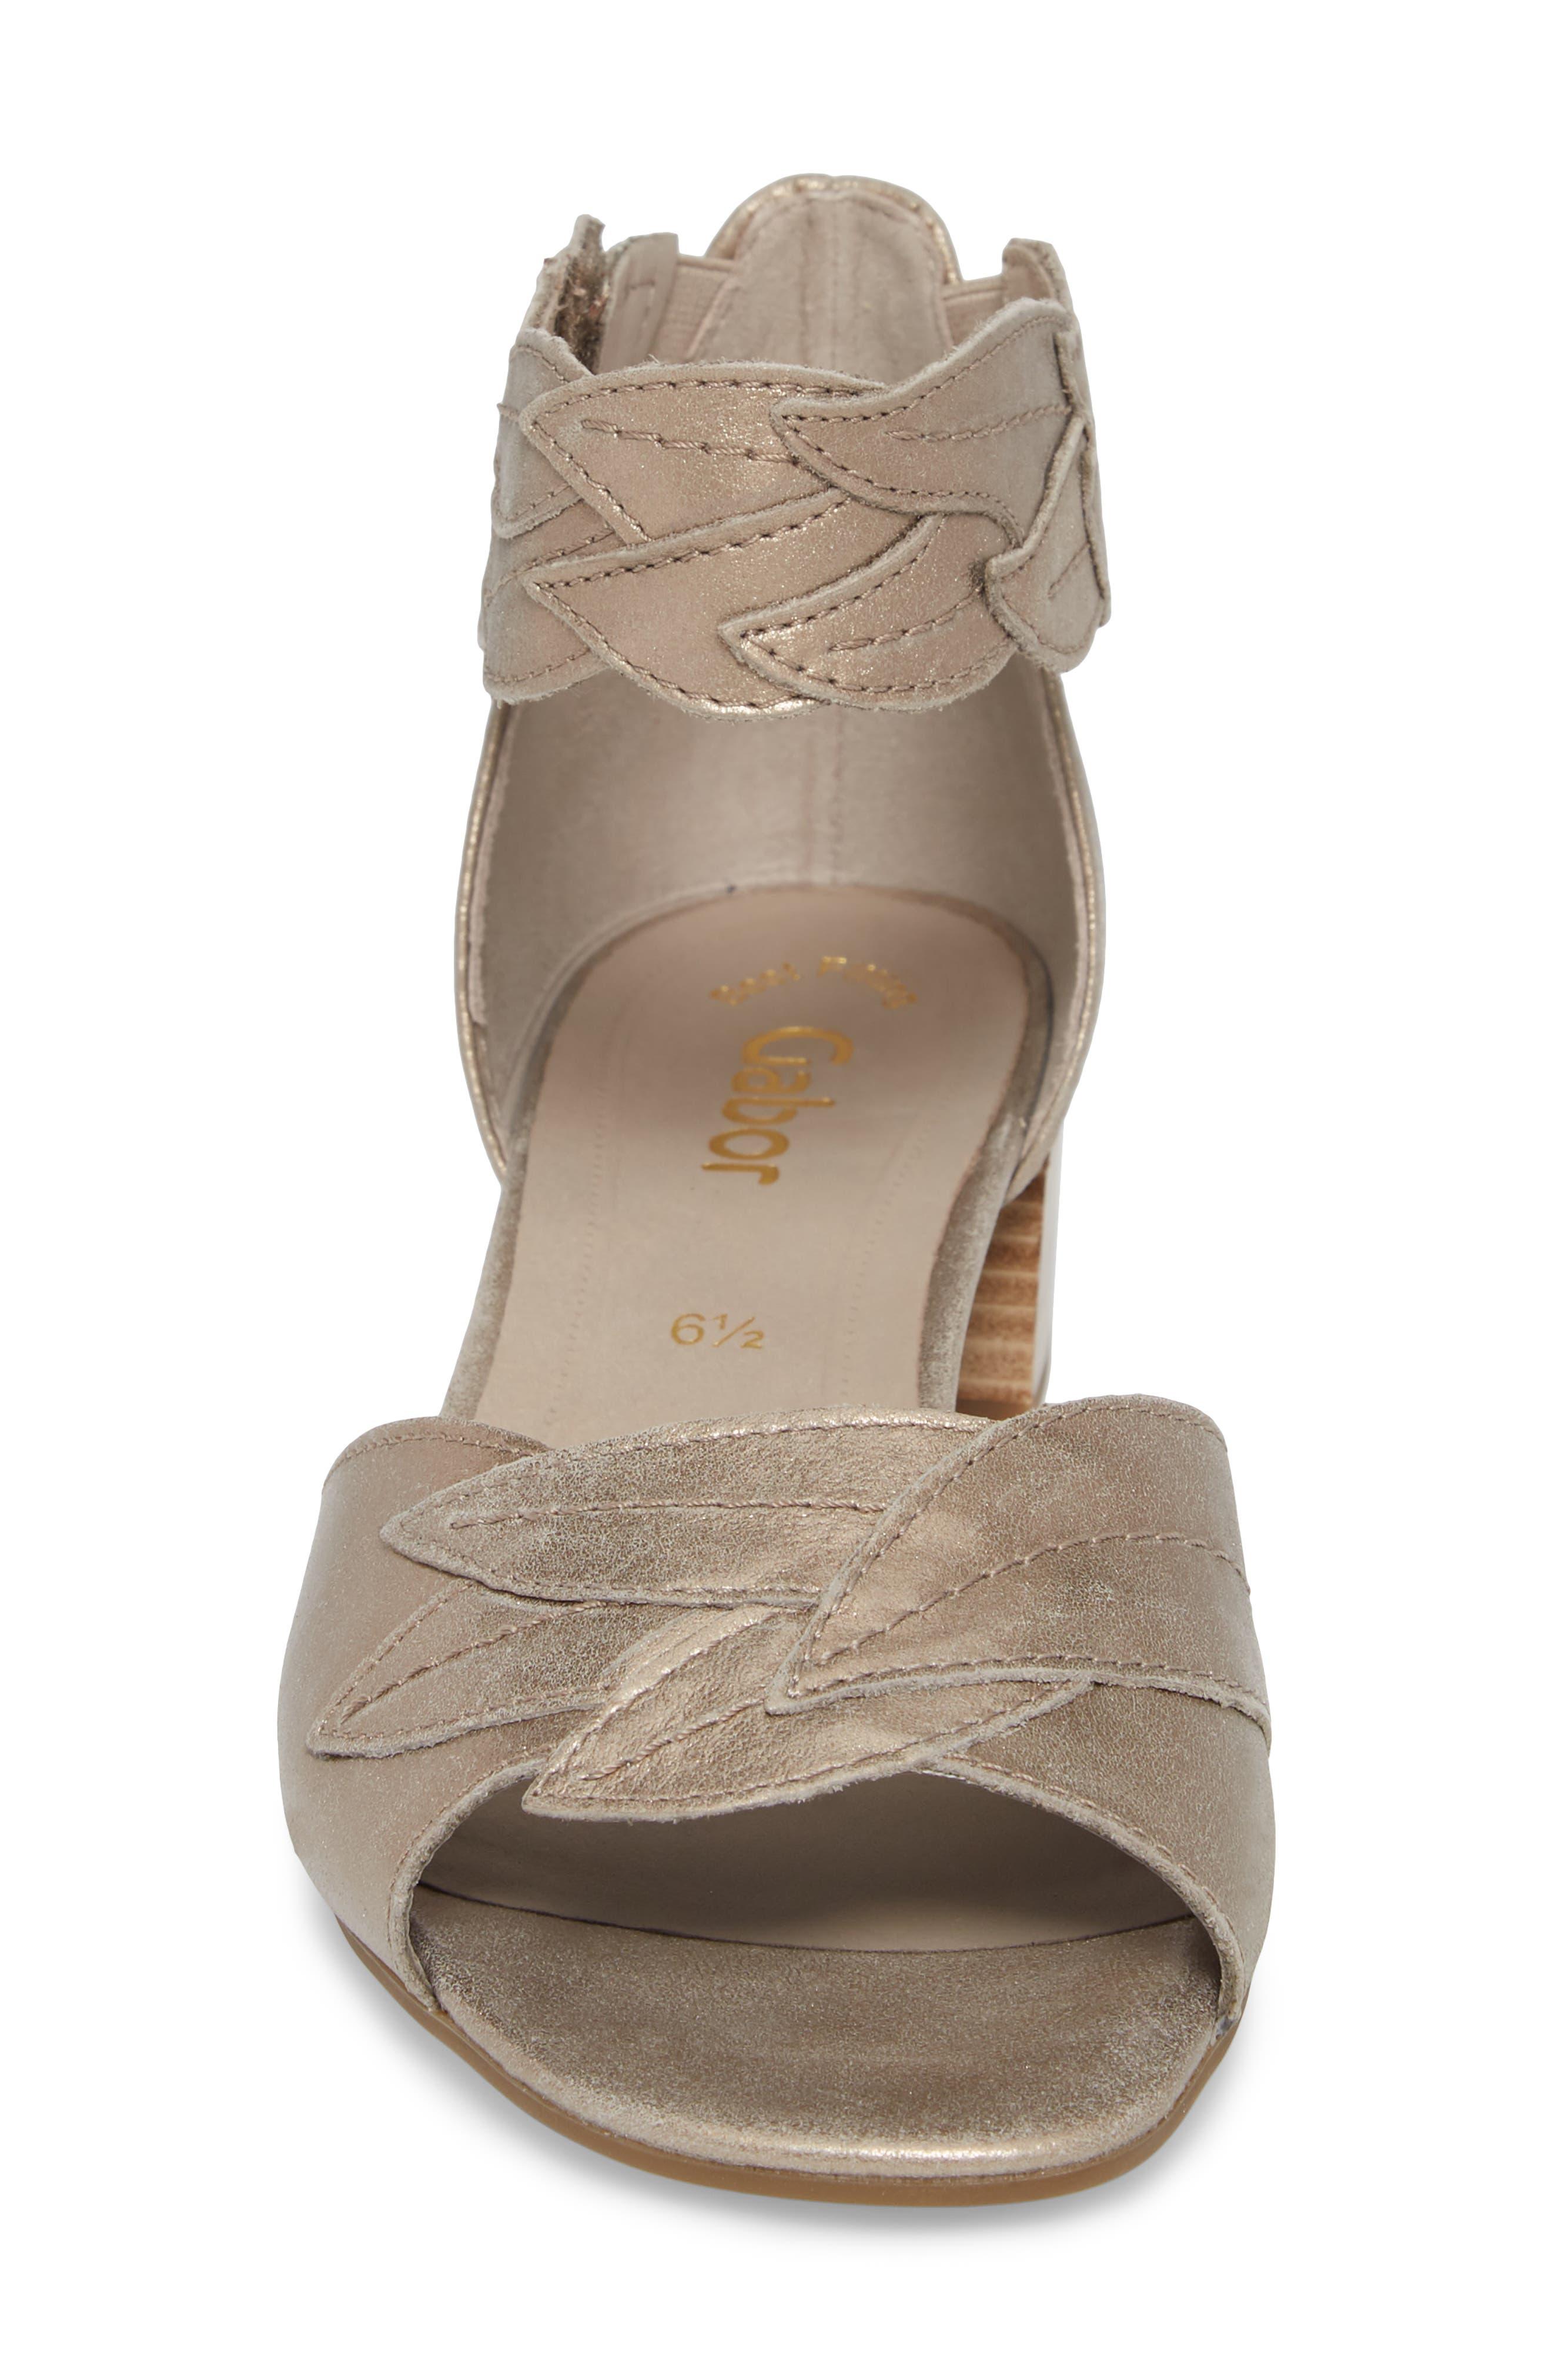 Leaf Ankle Strap Sandal,                             Alternate thumbnail 4, color,                             BEIGE METALLIC LEATHER